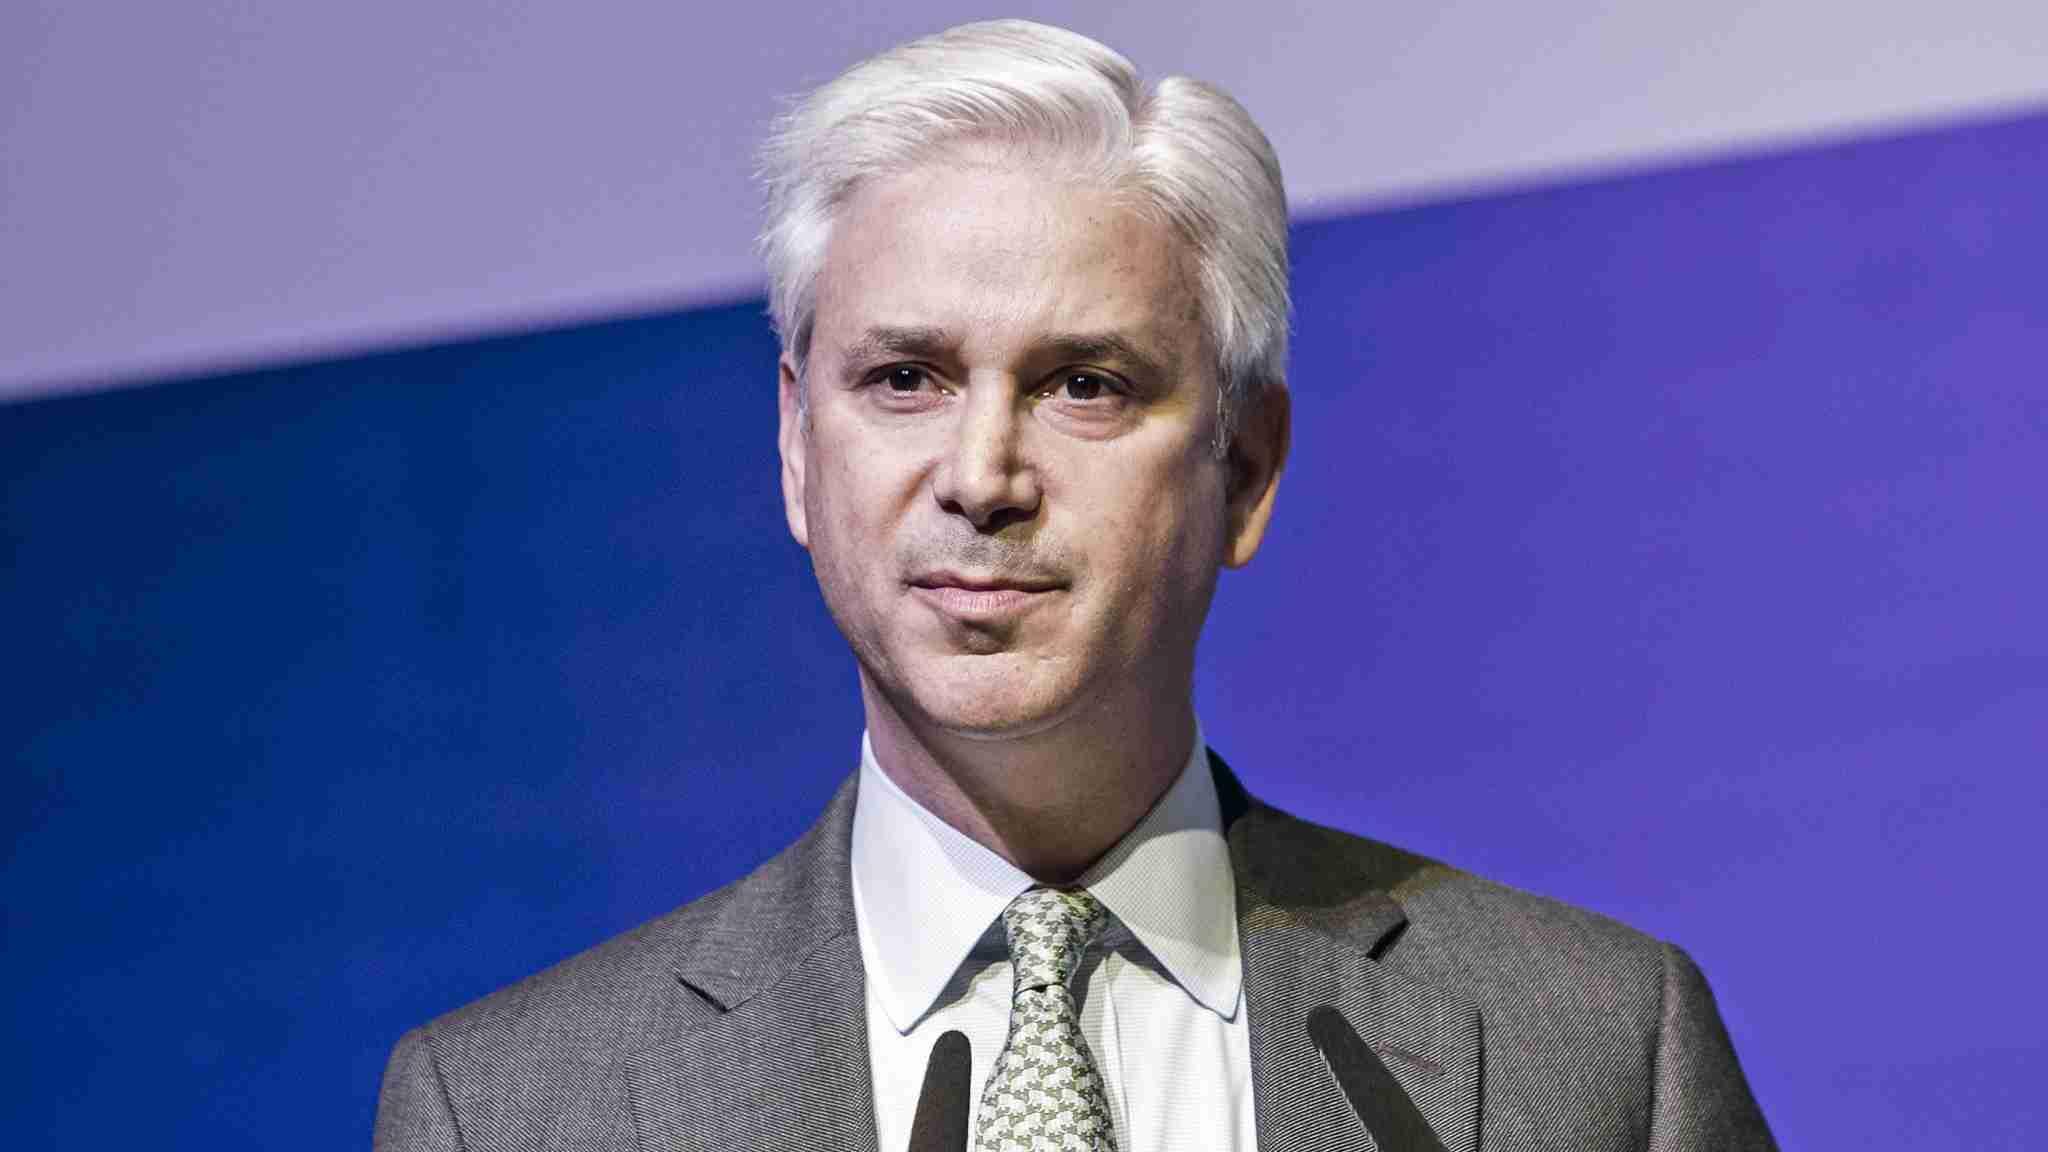 Wells Fargo CEO Charles Scharf